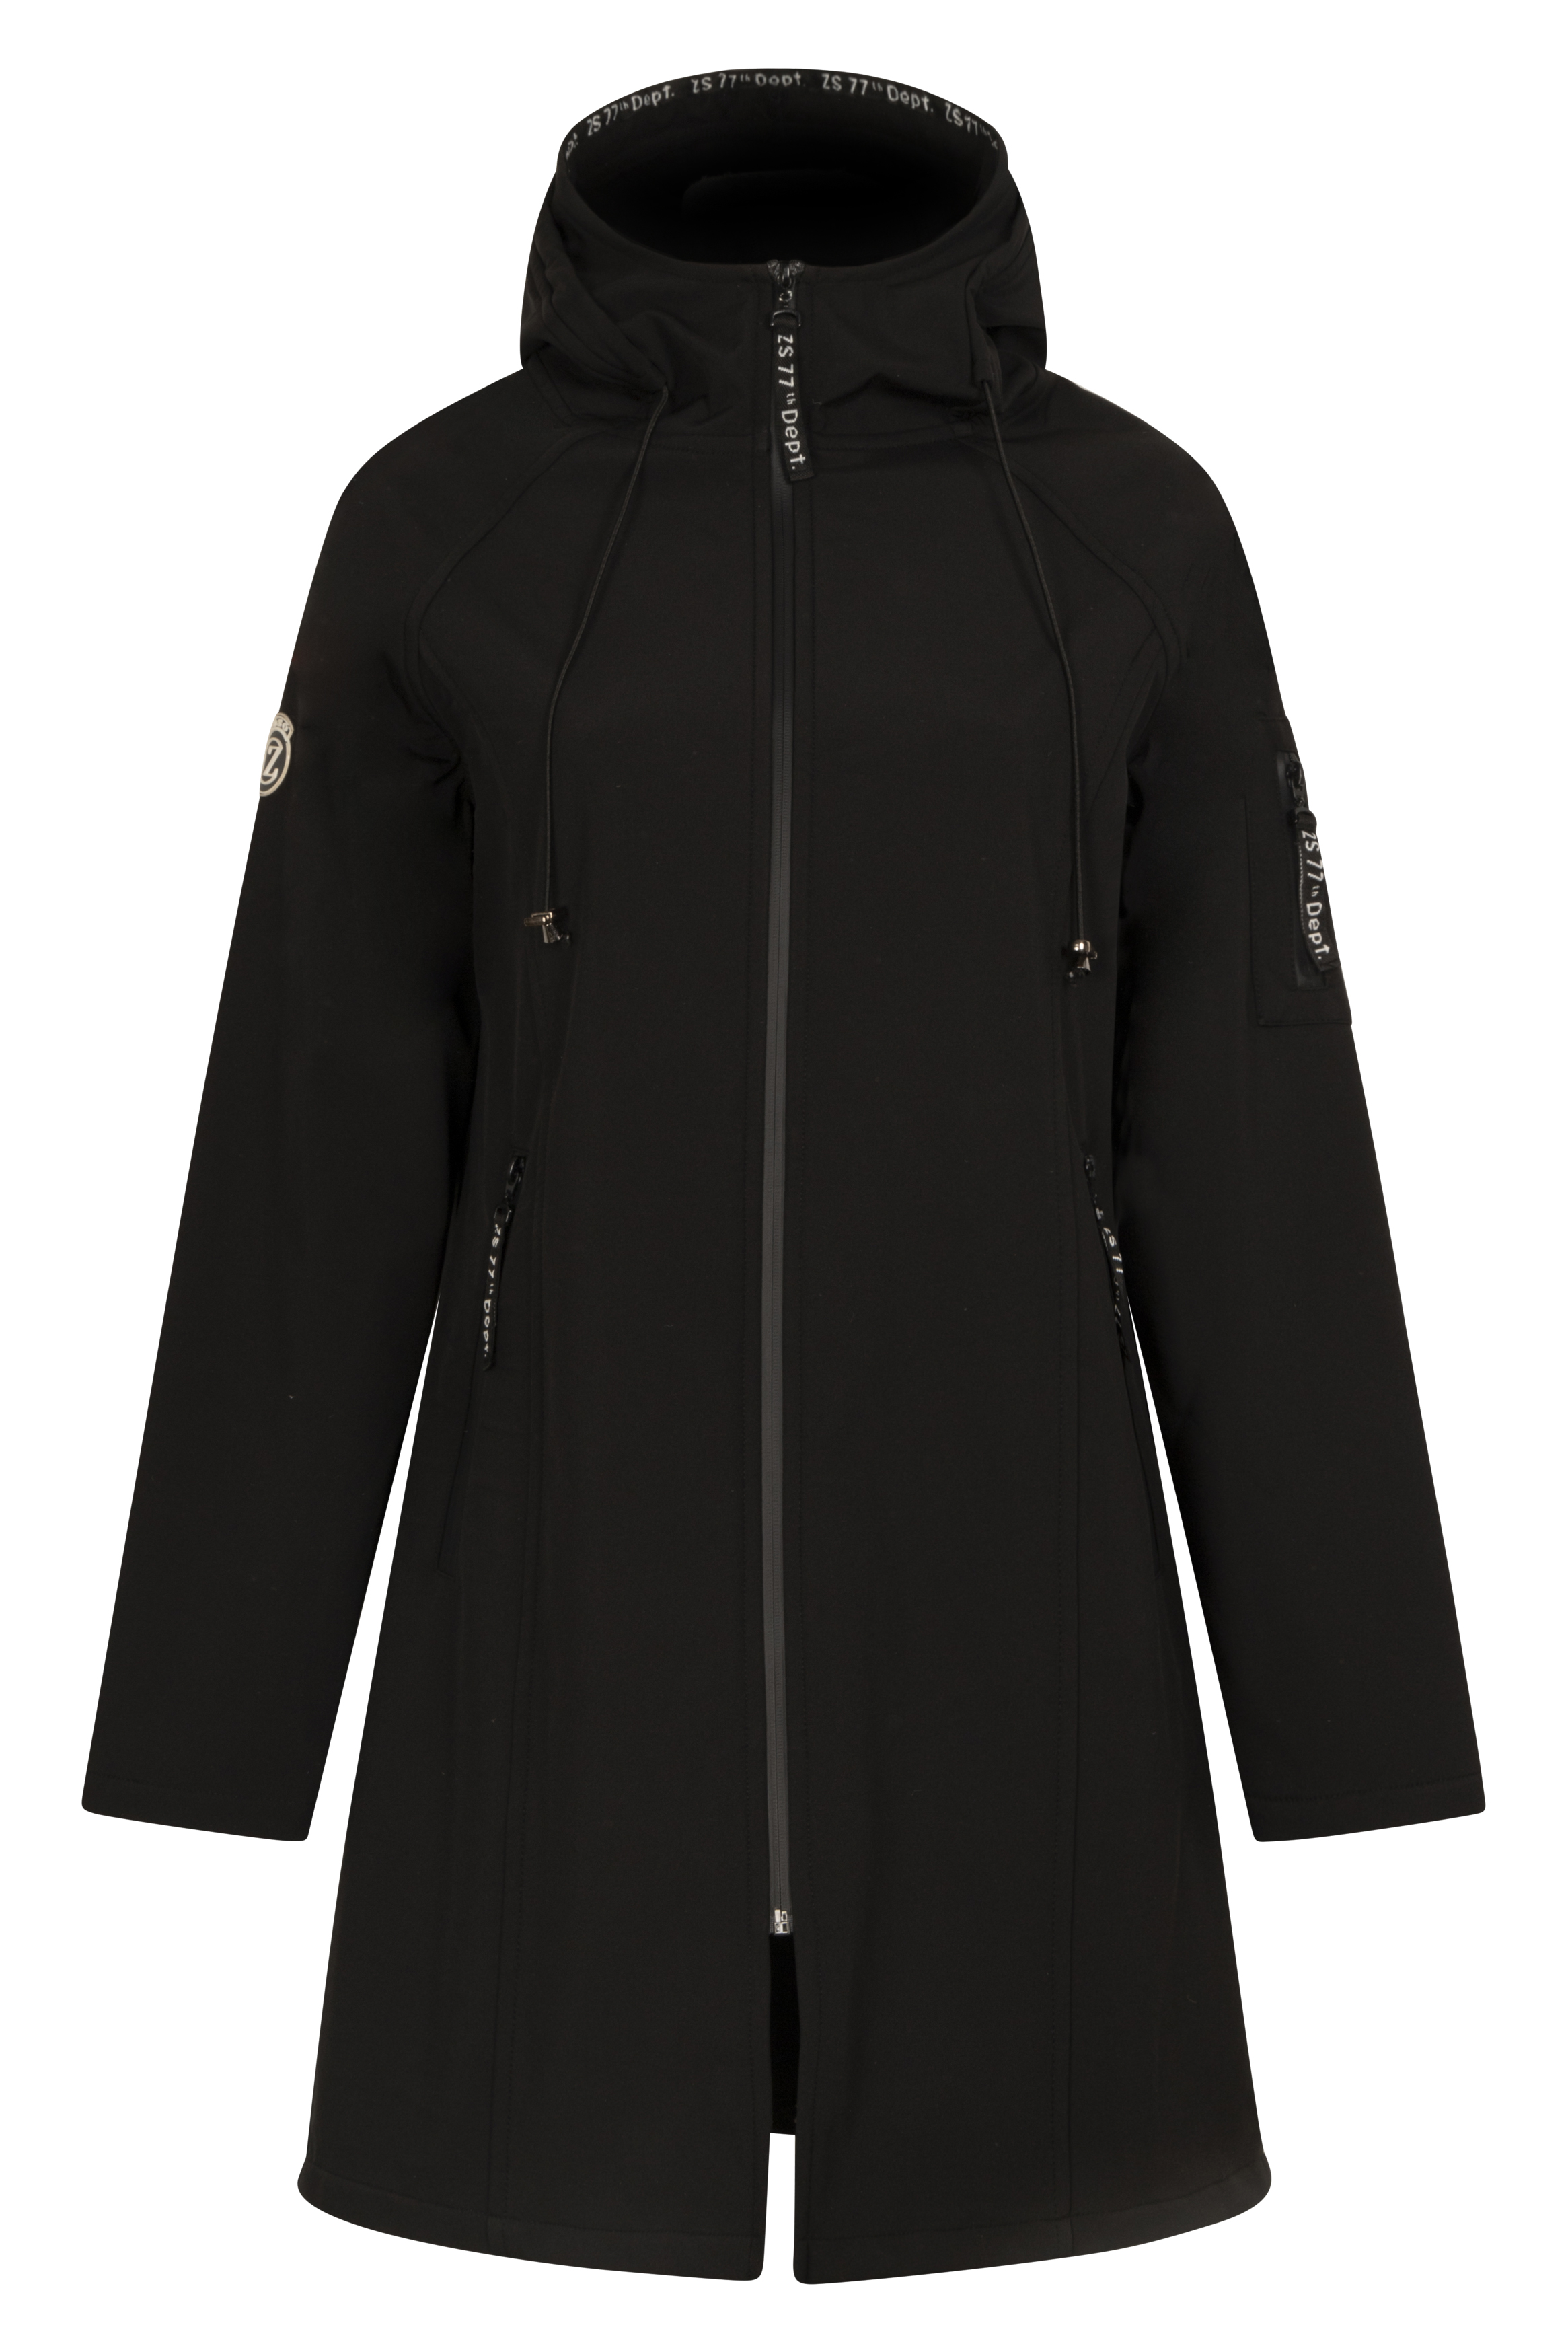 Softshell coat black